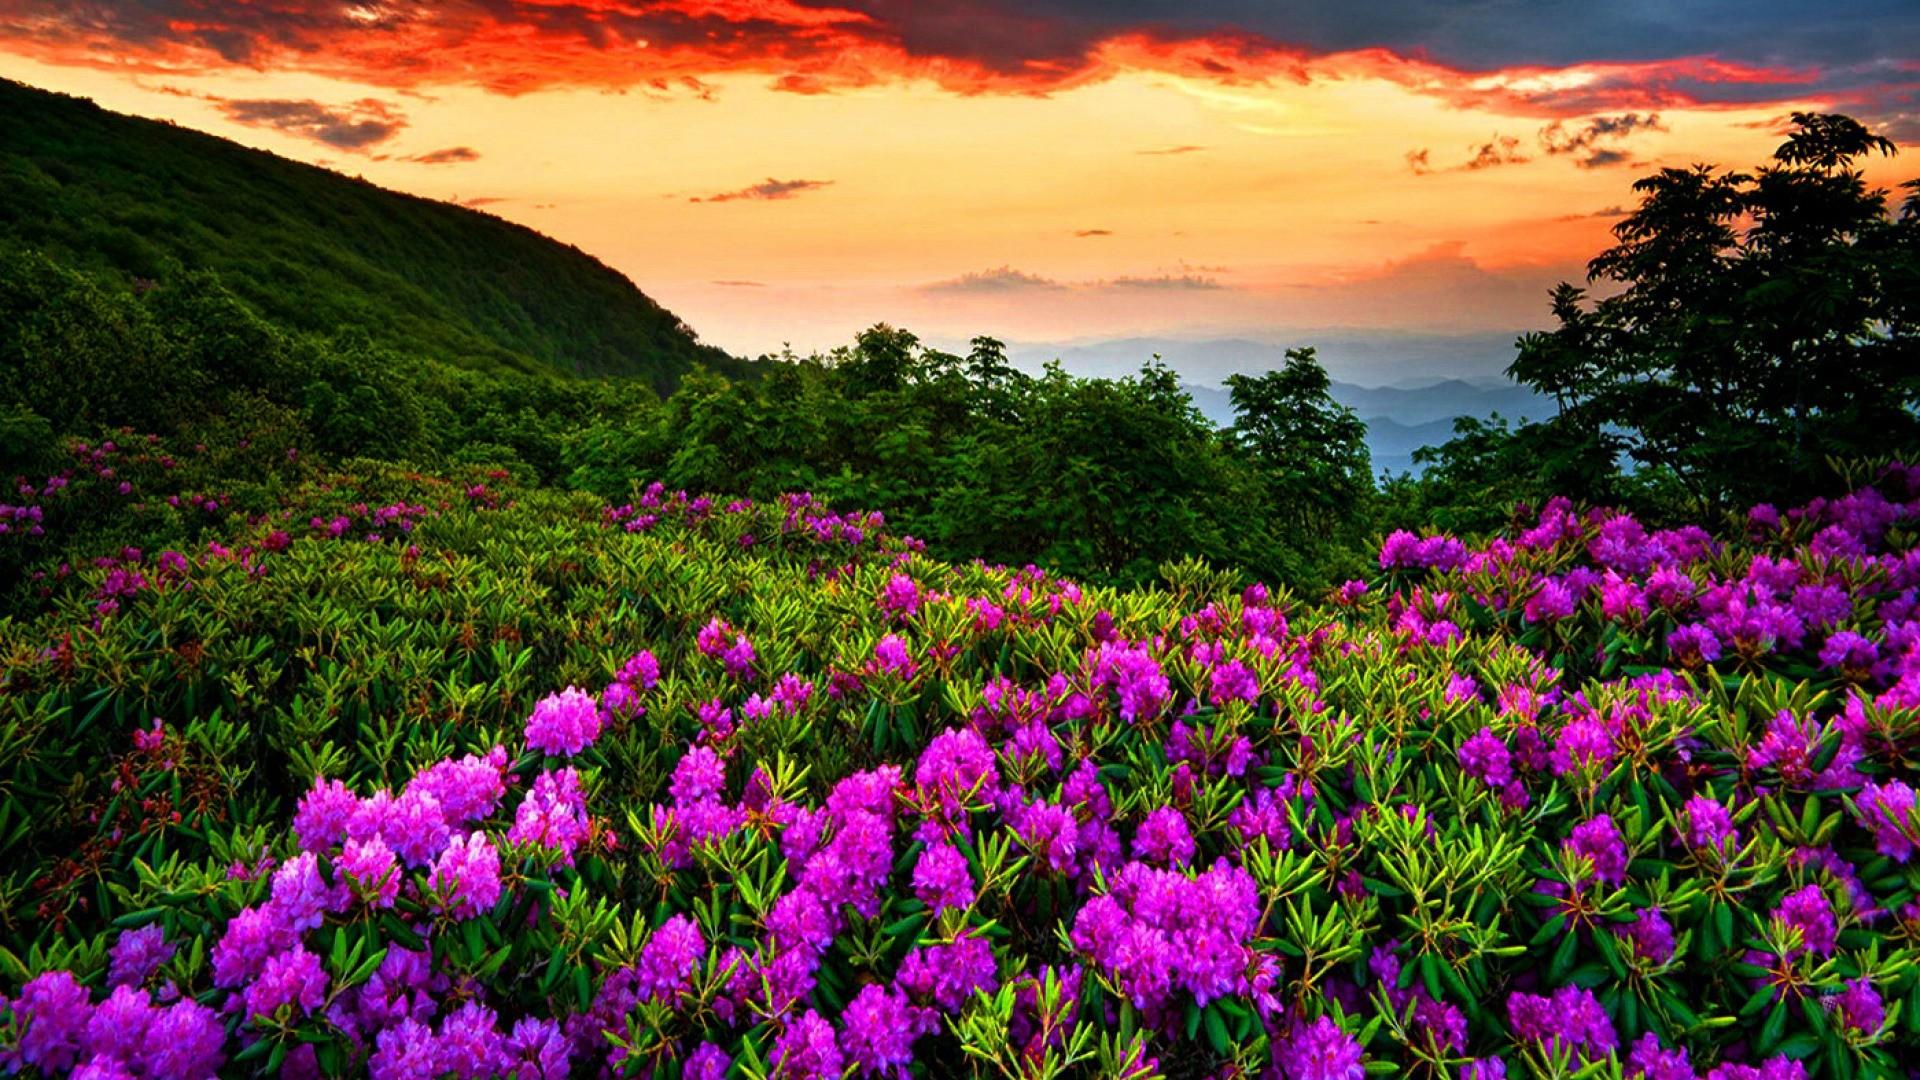 Spring Season Flowers Hd Desktop Wallpaper High Definition 1920x1080